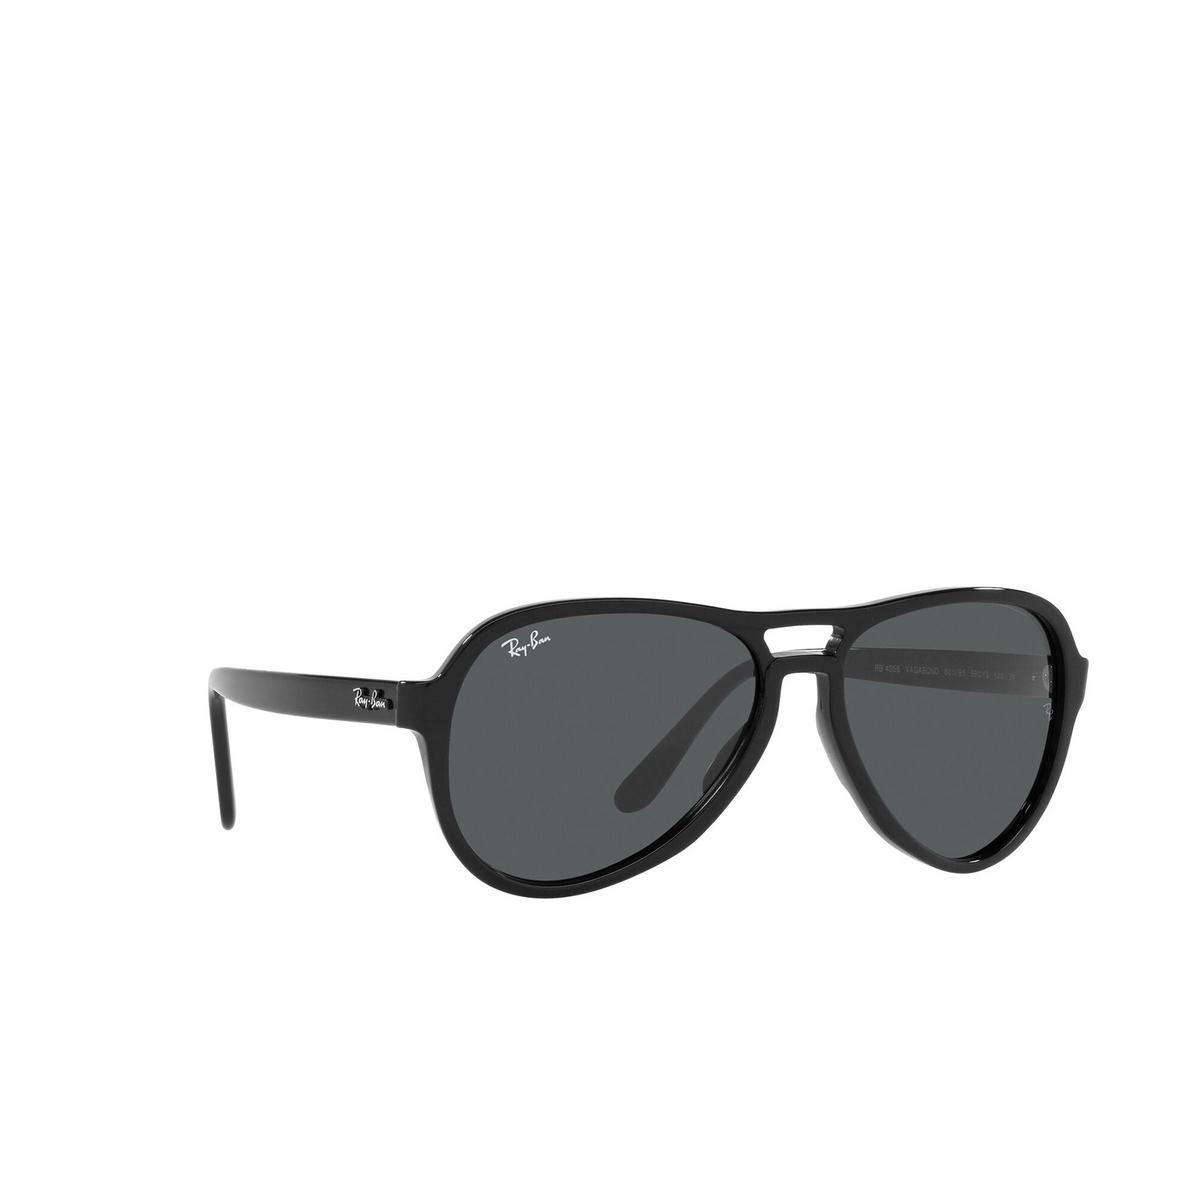 Ray-Ban® Aviator Sunglasses: Vagabond RB4355 color Black 601/B1 - three-quarters view.